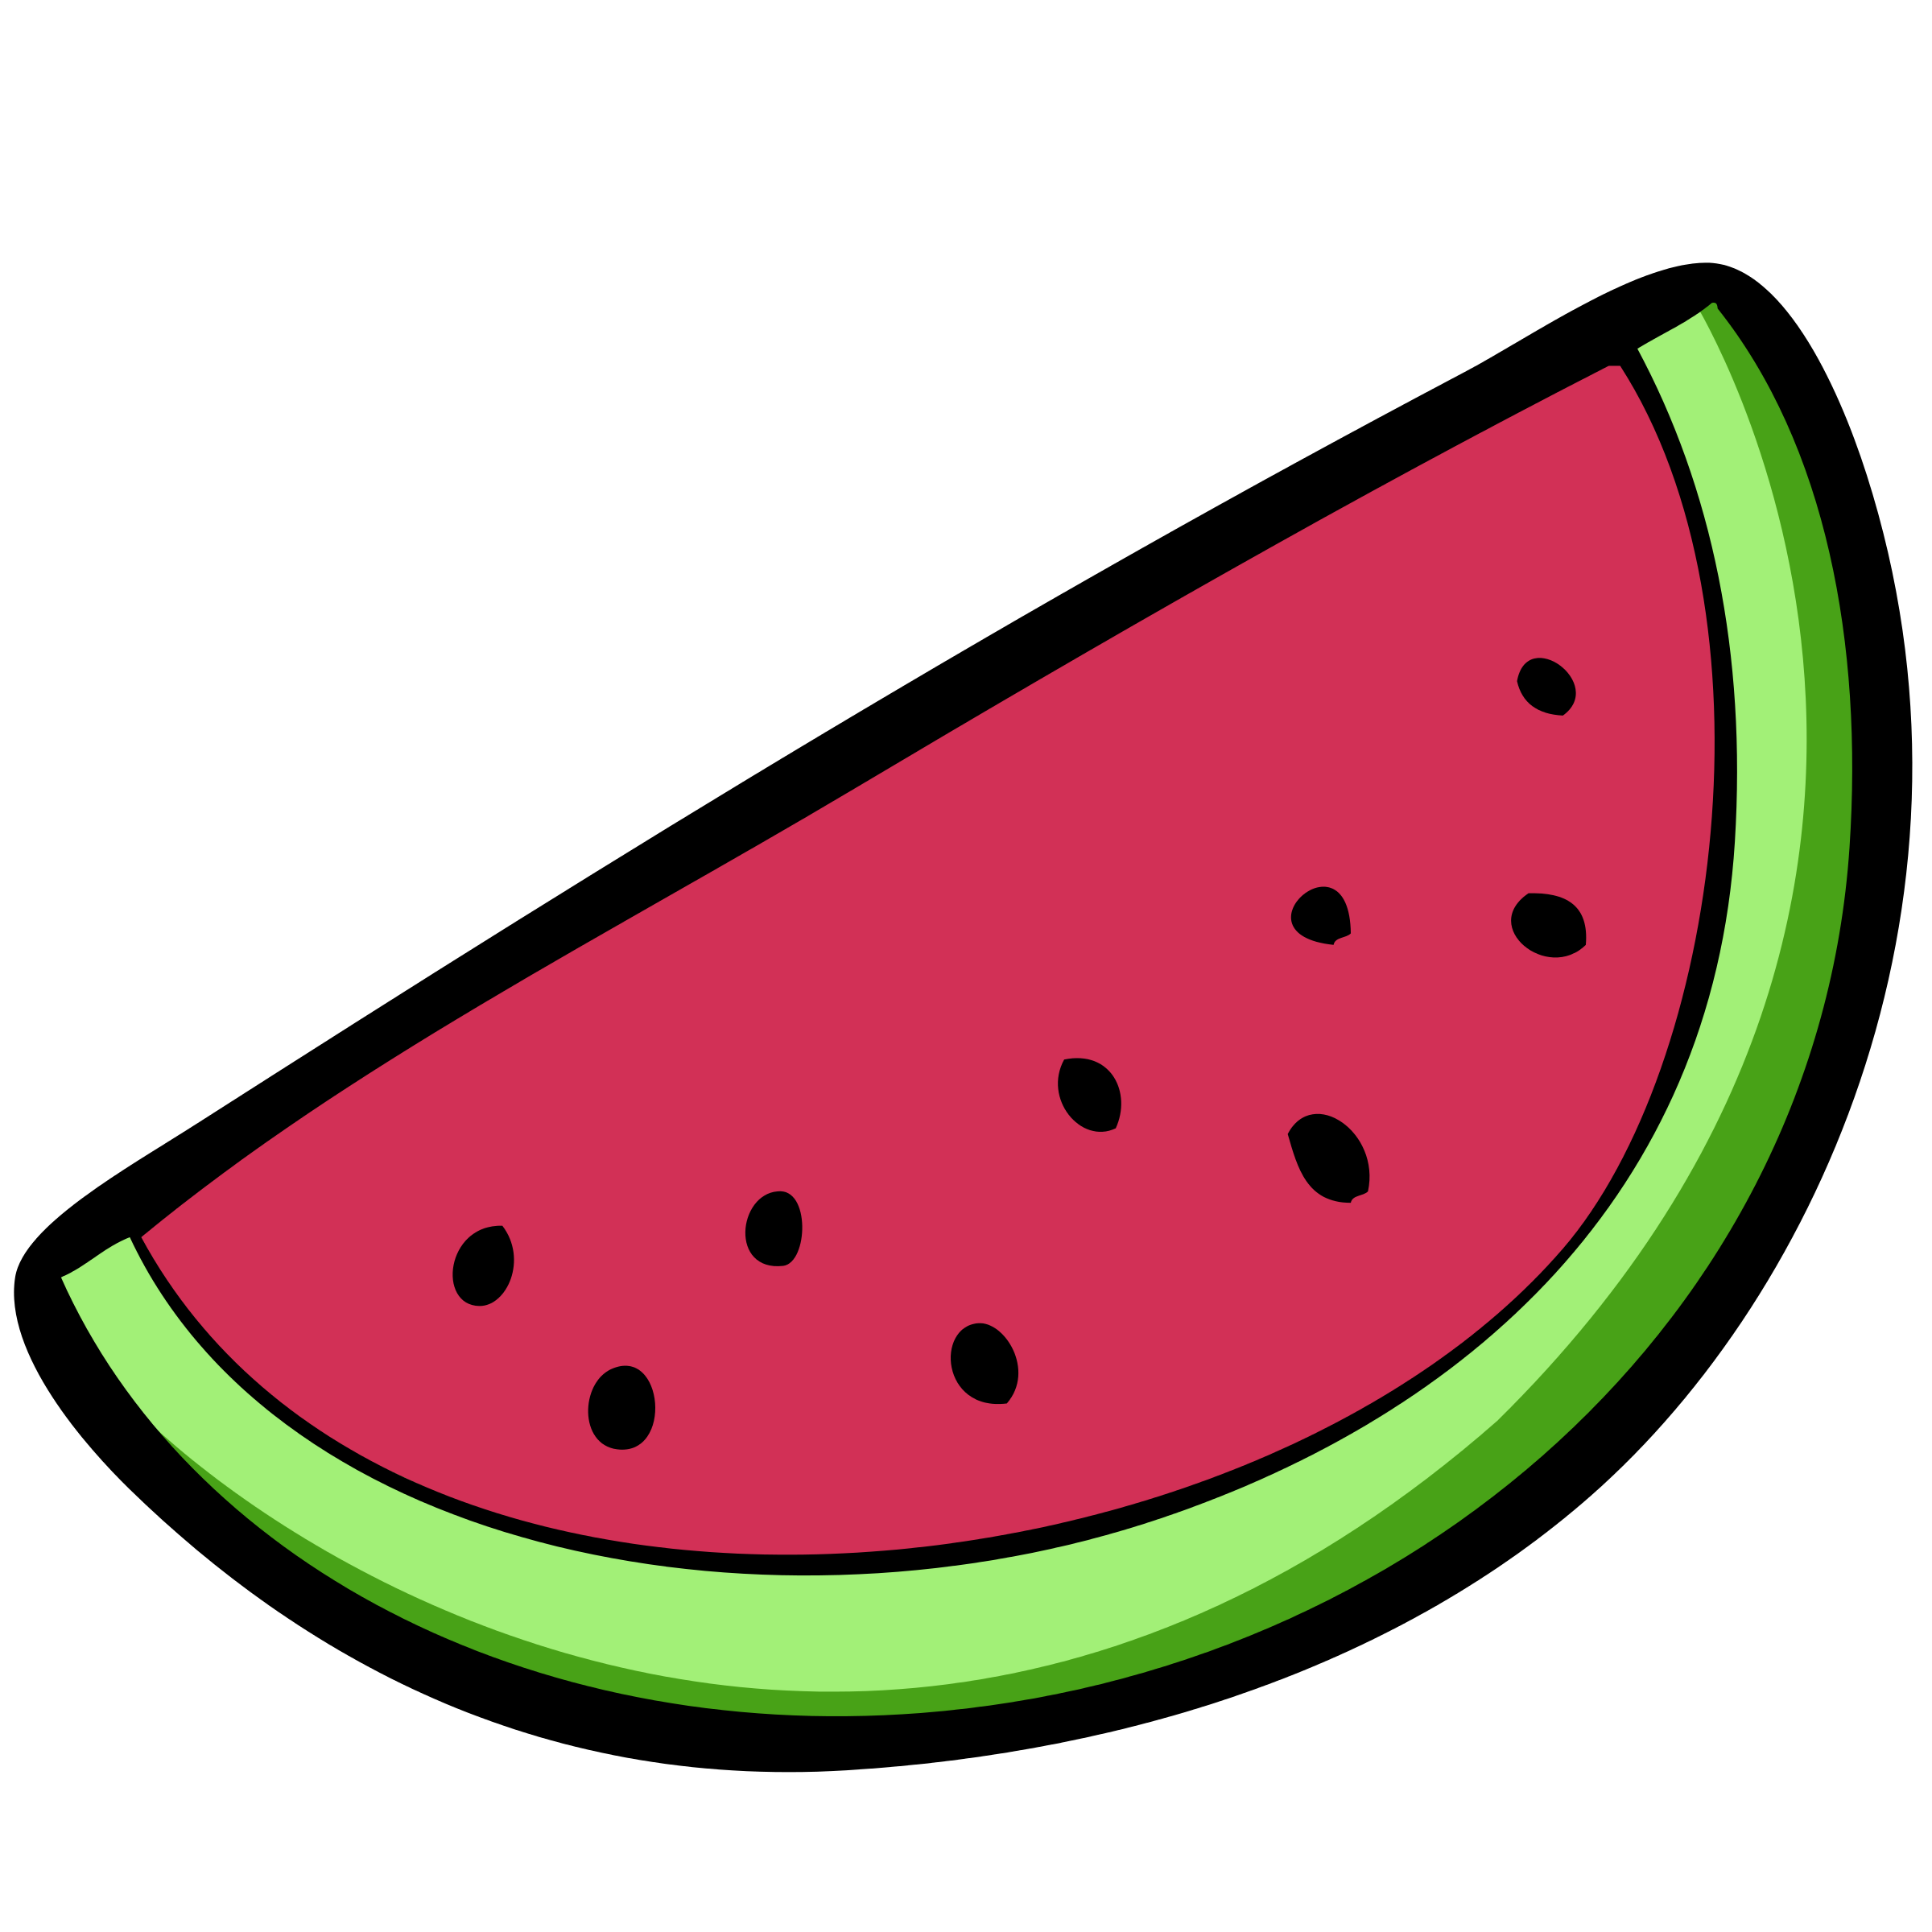 Watermelon clipart transparent background svg library stock Free Watermelon Transparent, Download Free Clip Art, Free ... svg library stock